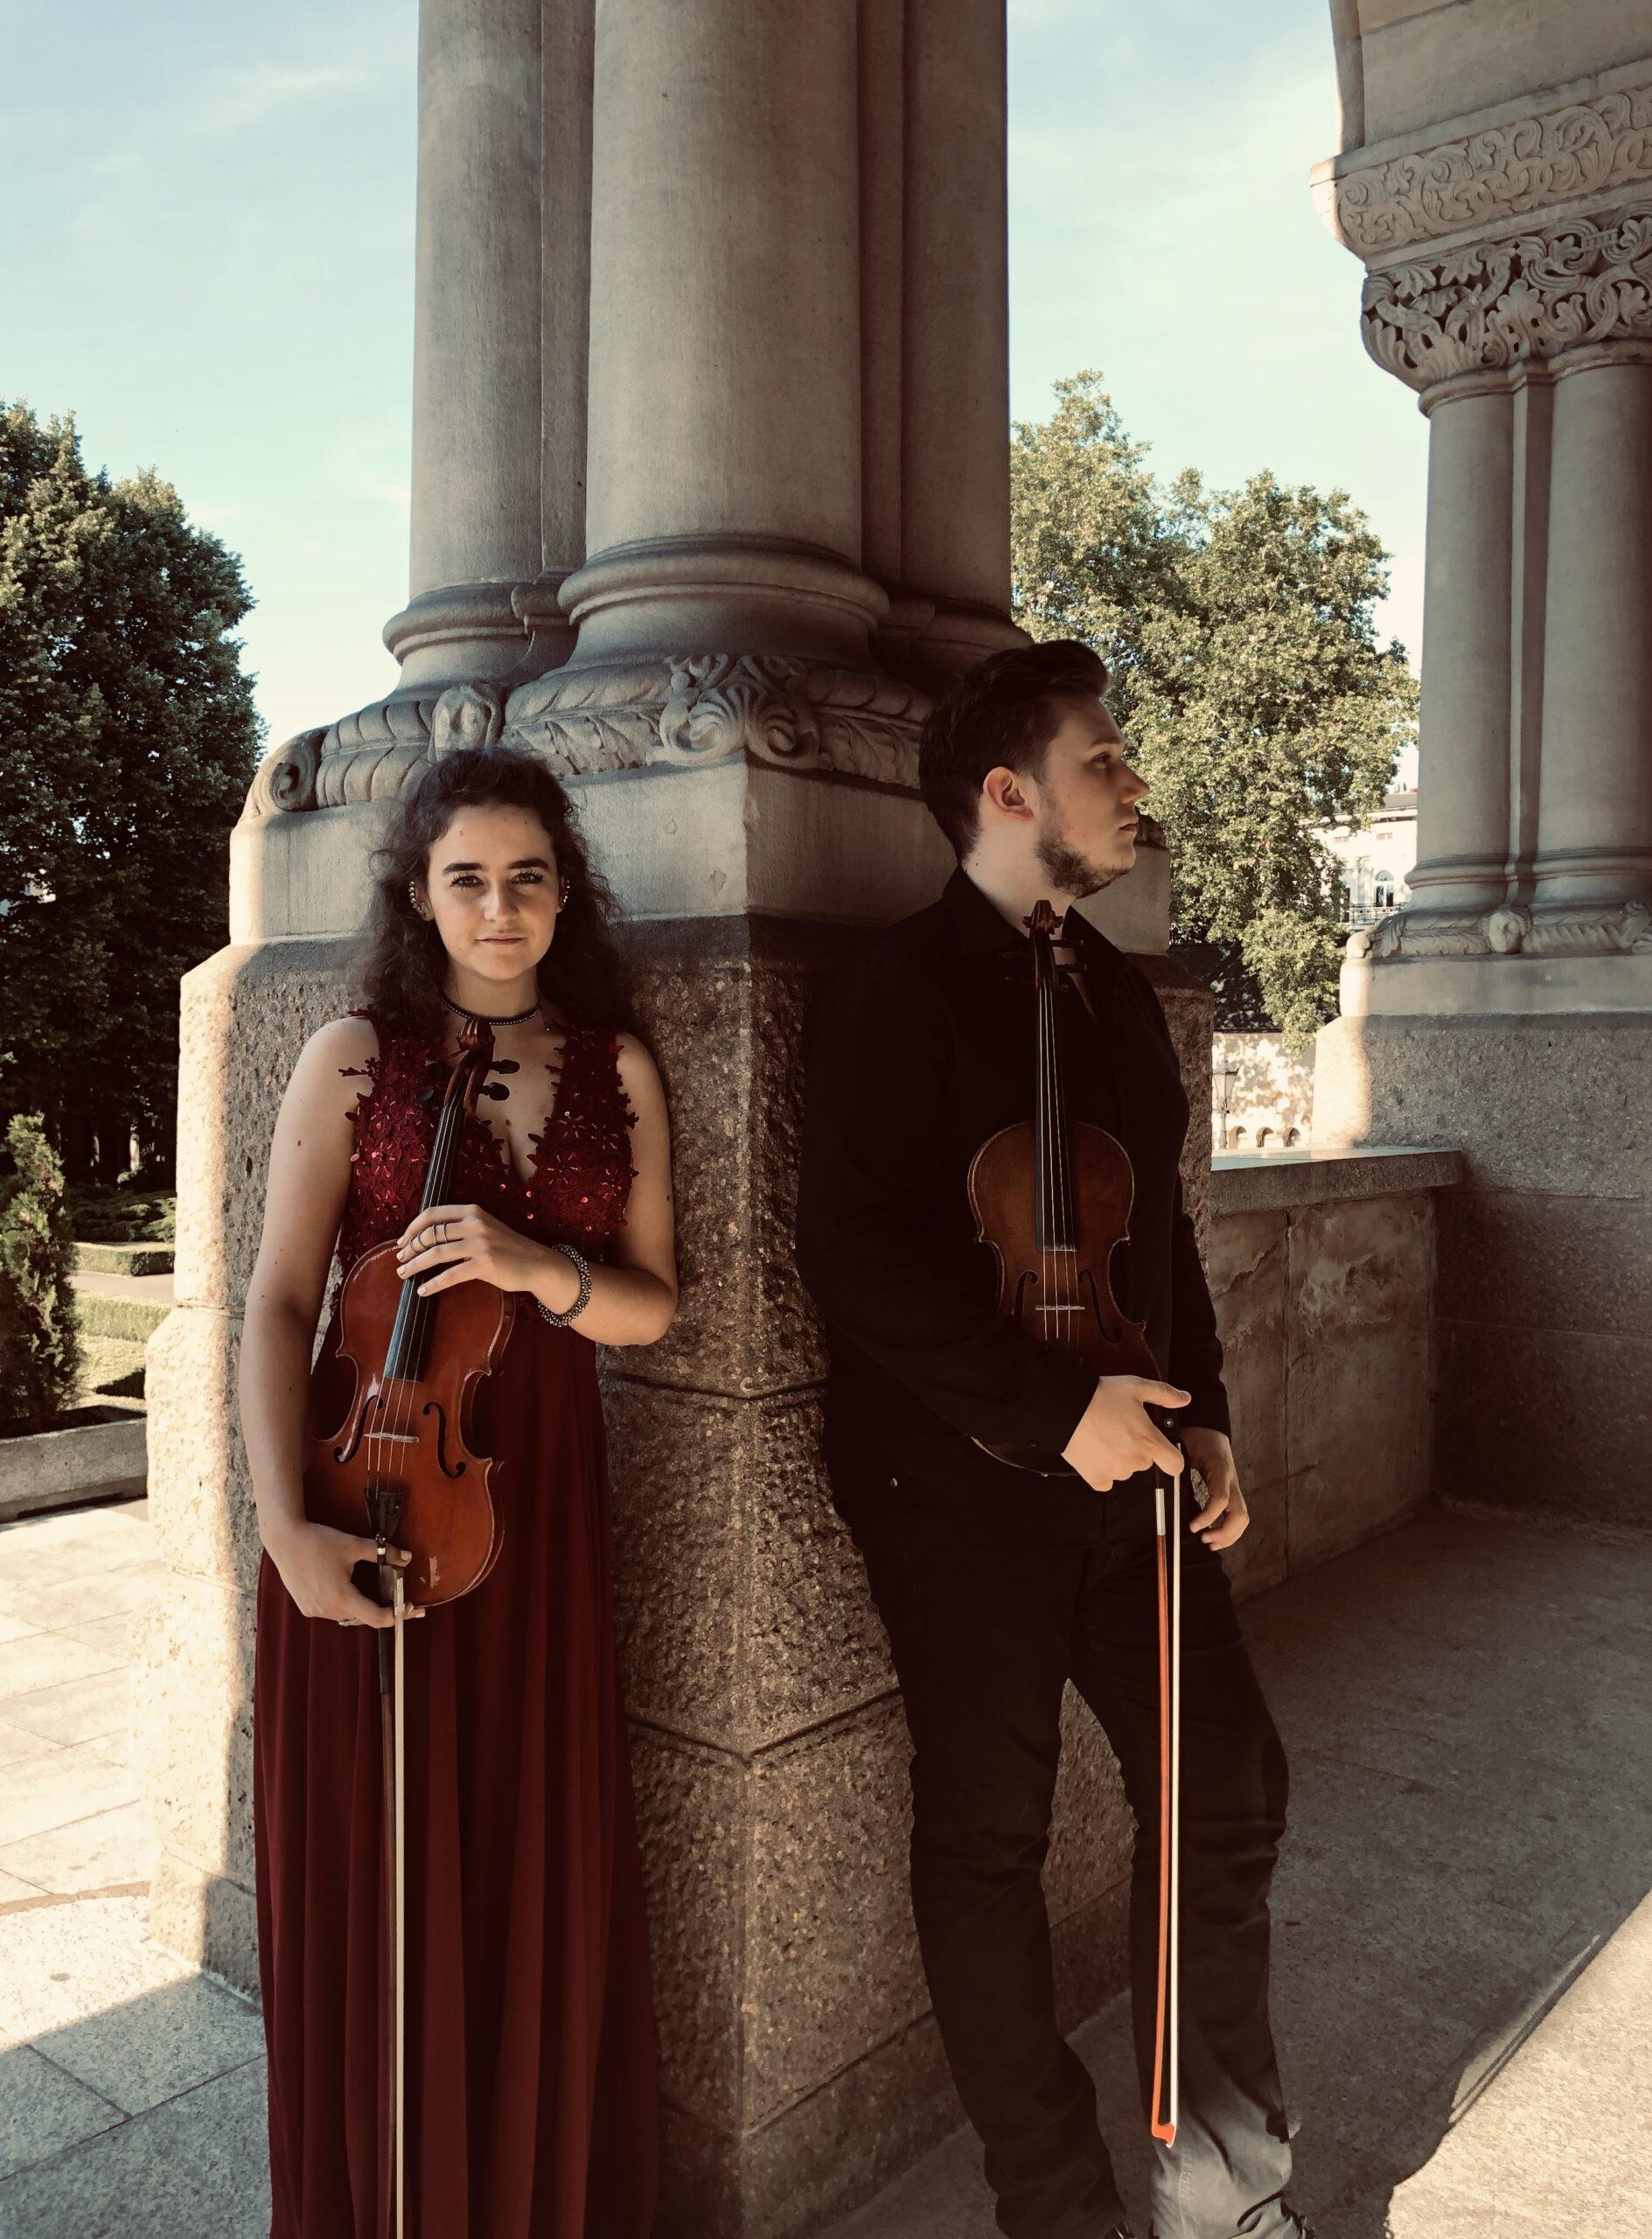 Gidaszewska/Łaguniak Duo - Polish Violin Duo